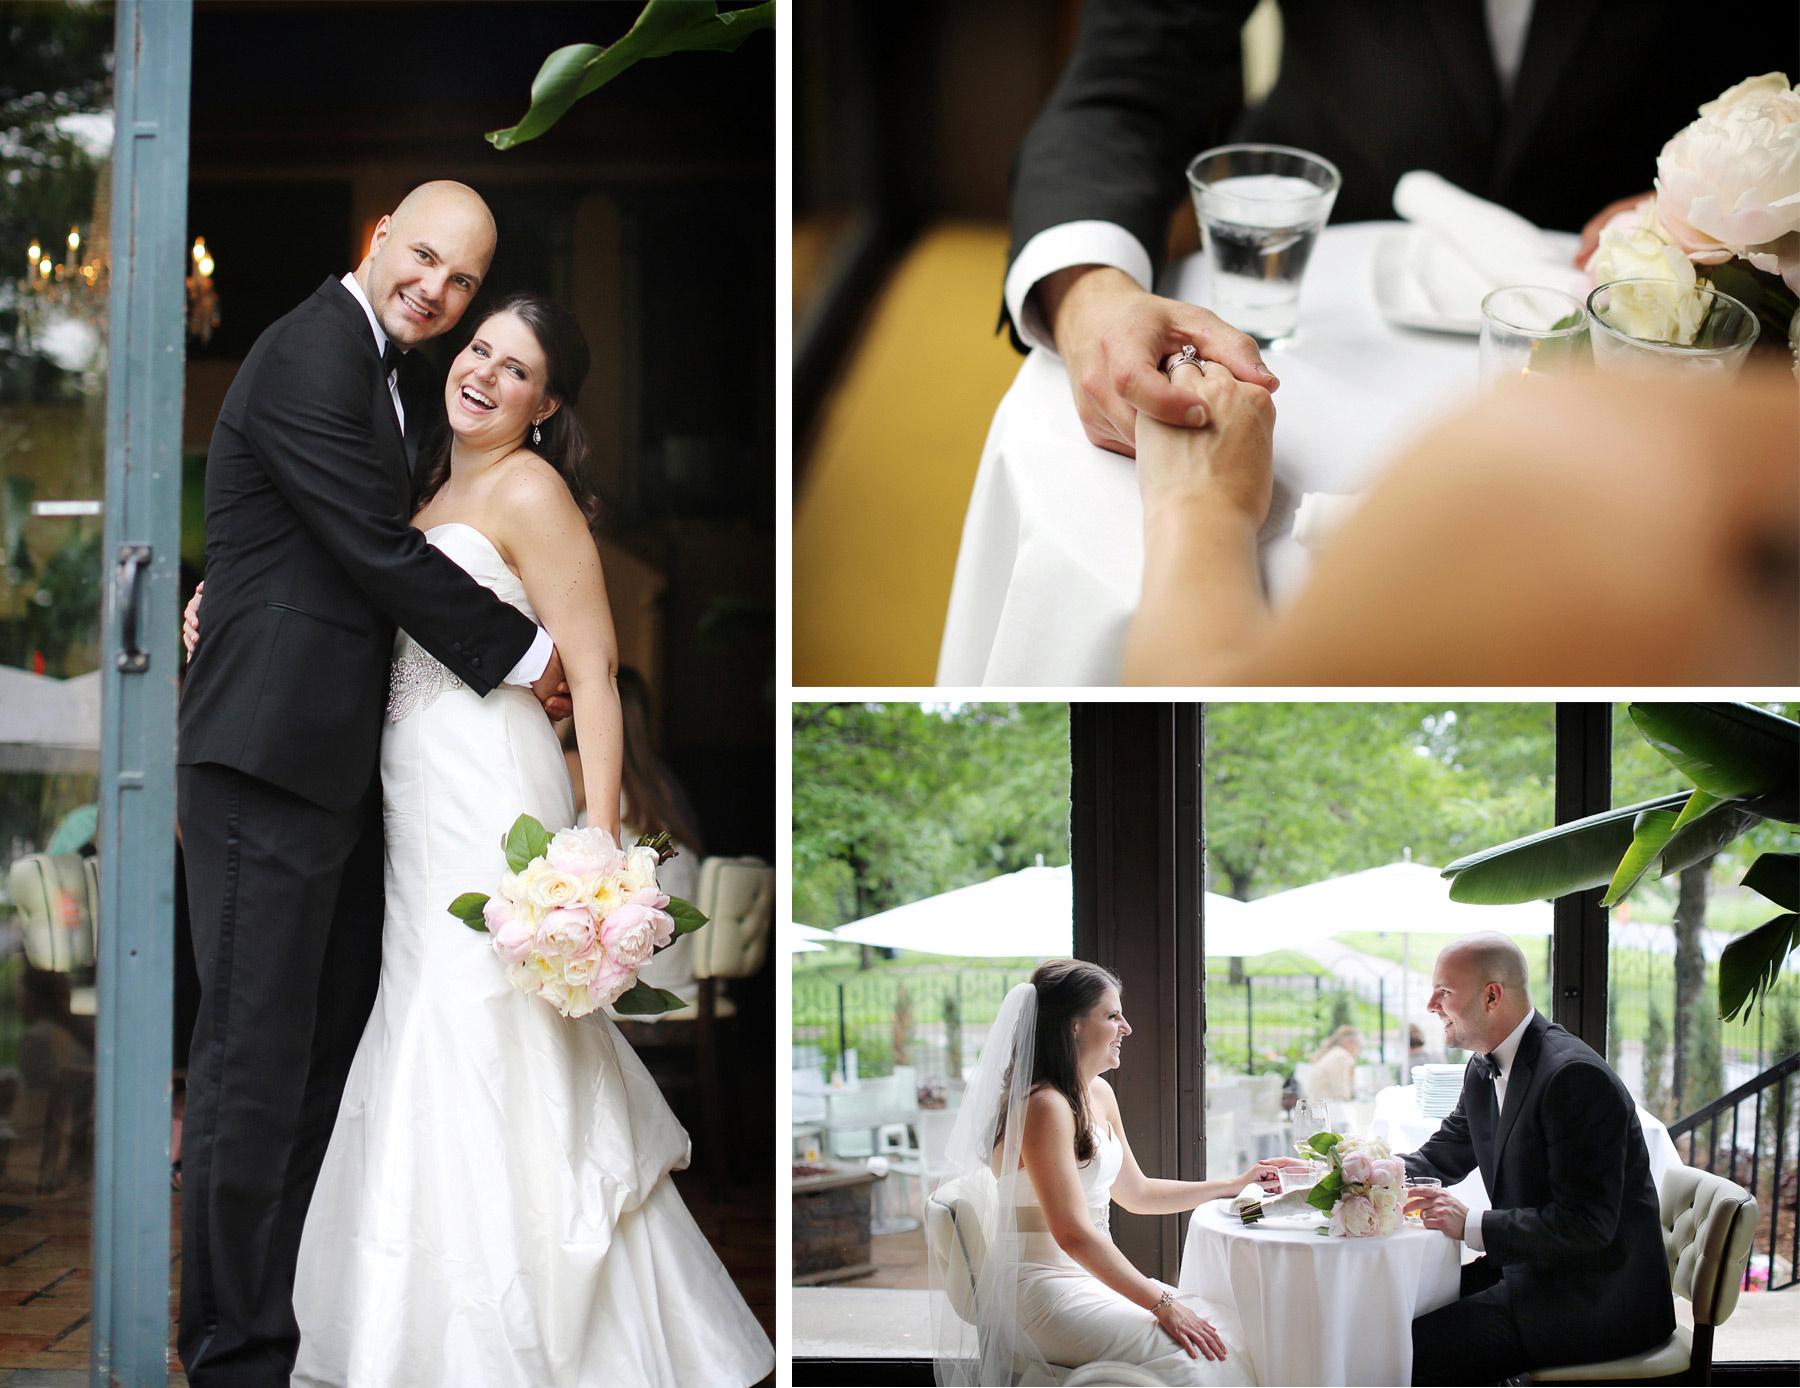 13-Minneapolis-Minnesota-Wedding-Photography-by-Vick-Photography-Downtown-Cafe-Lurcat-Nikki-and-Matt.jpg